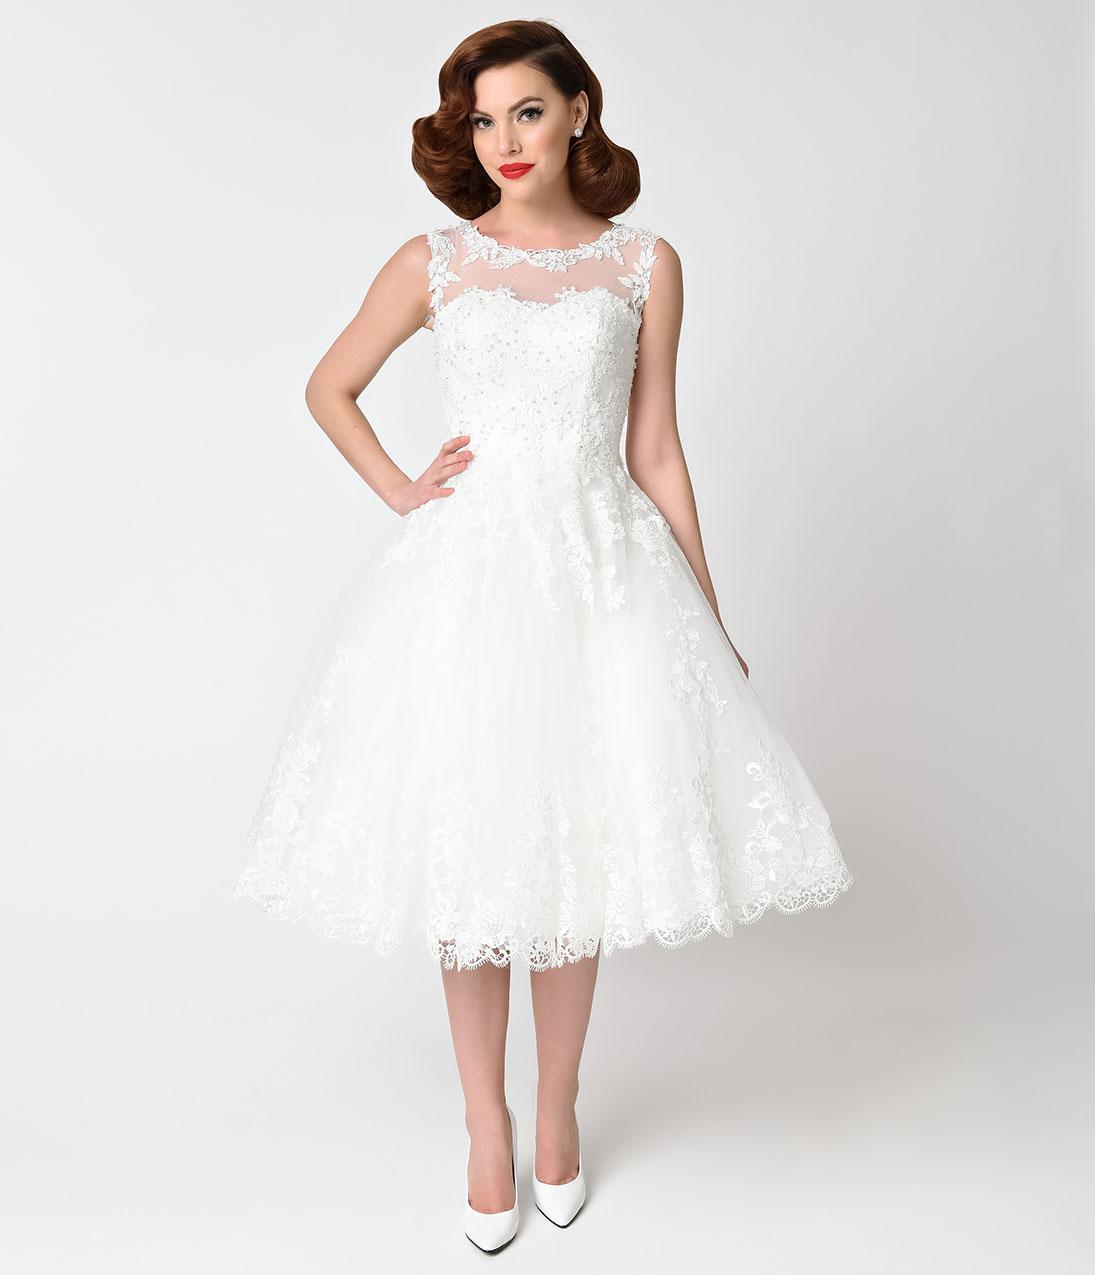 vintage style wedding dresses vintage inspired wedding dresses unique vintage 1950s style ivory lace  tulle riviera bridal UCDFHEU